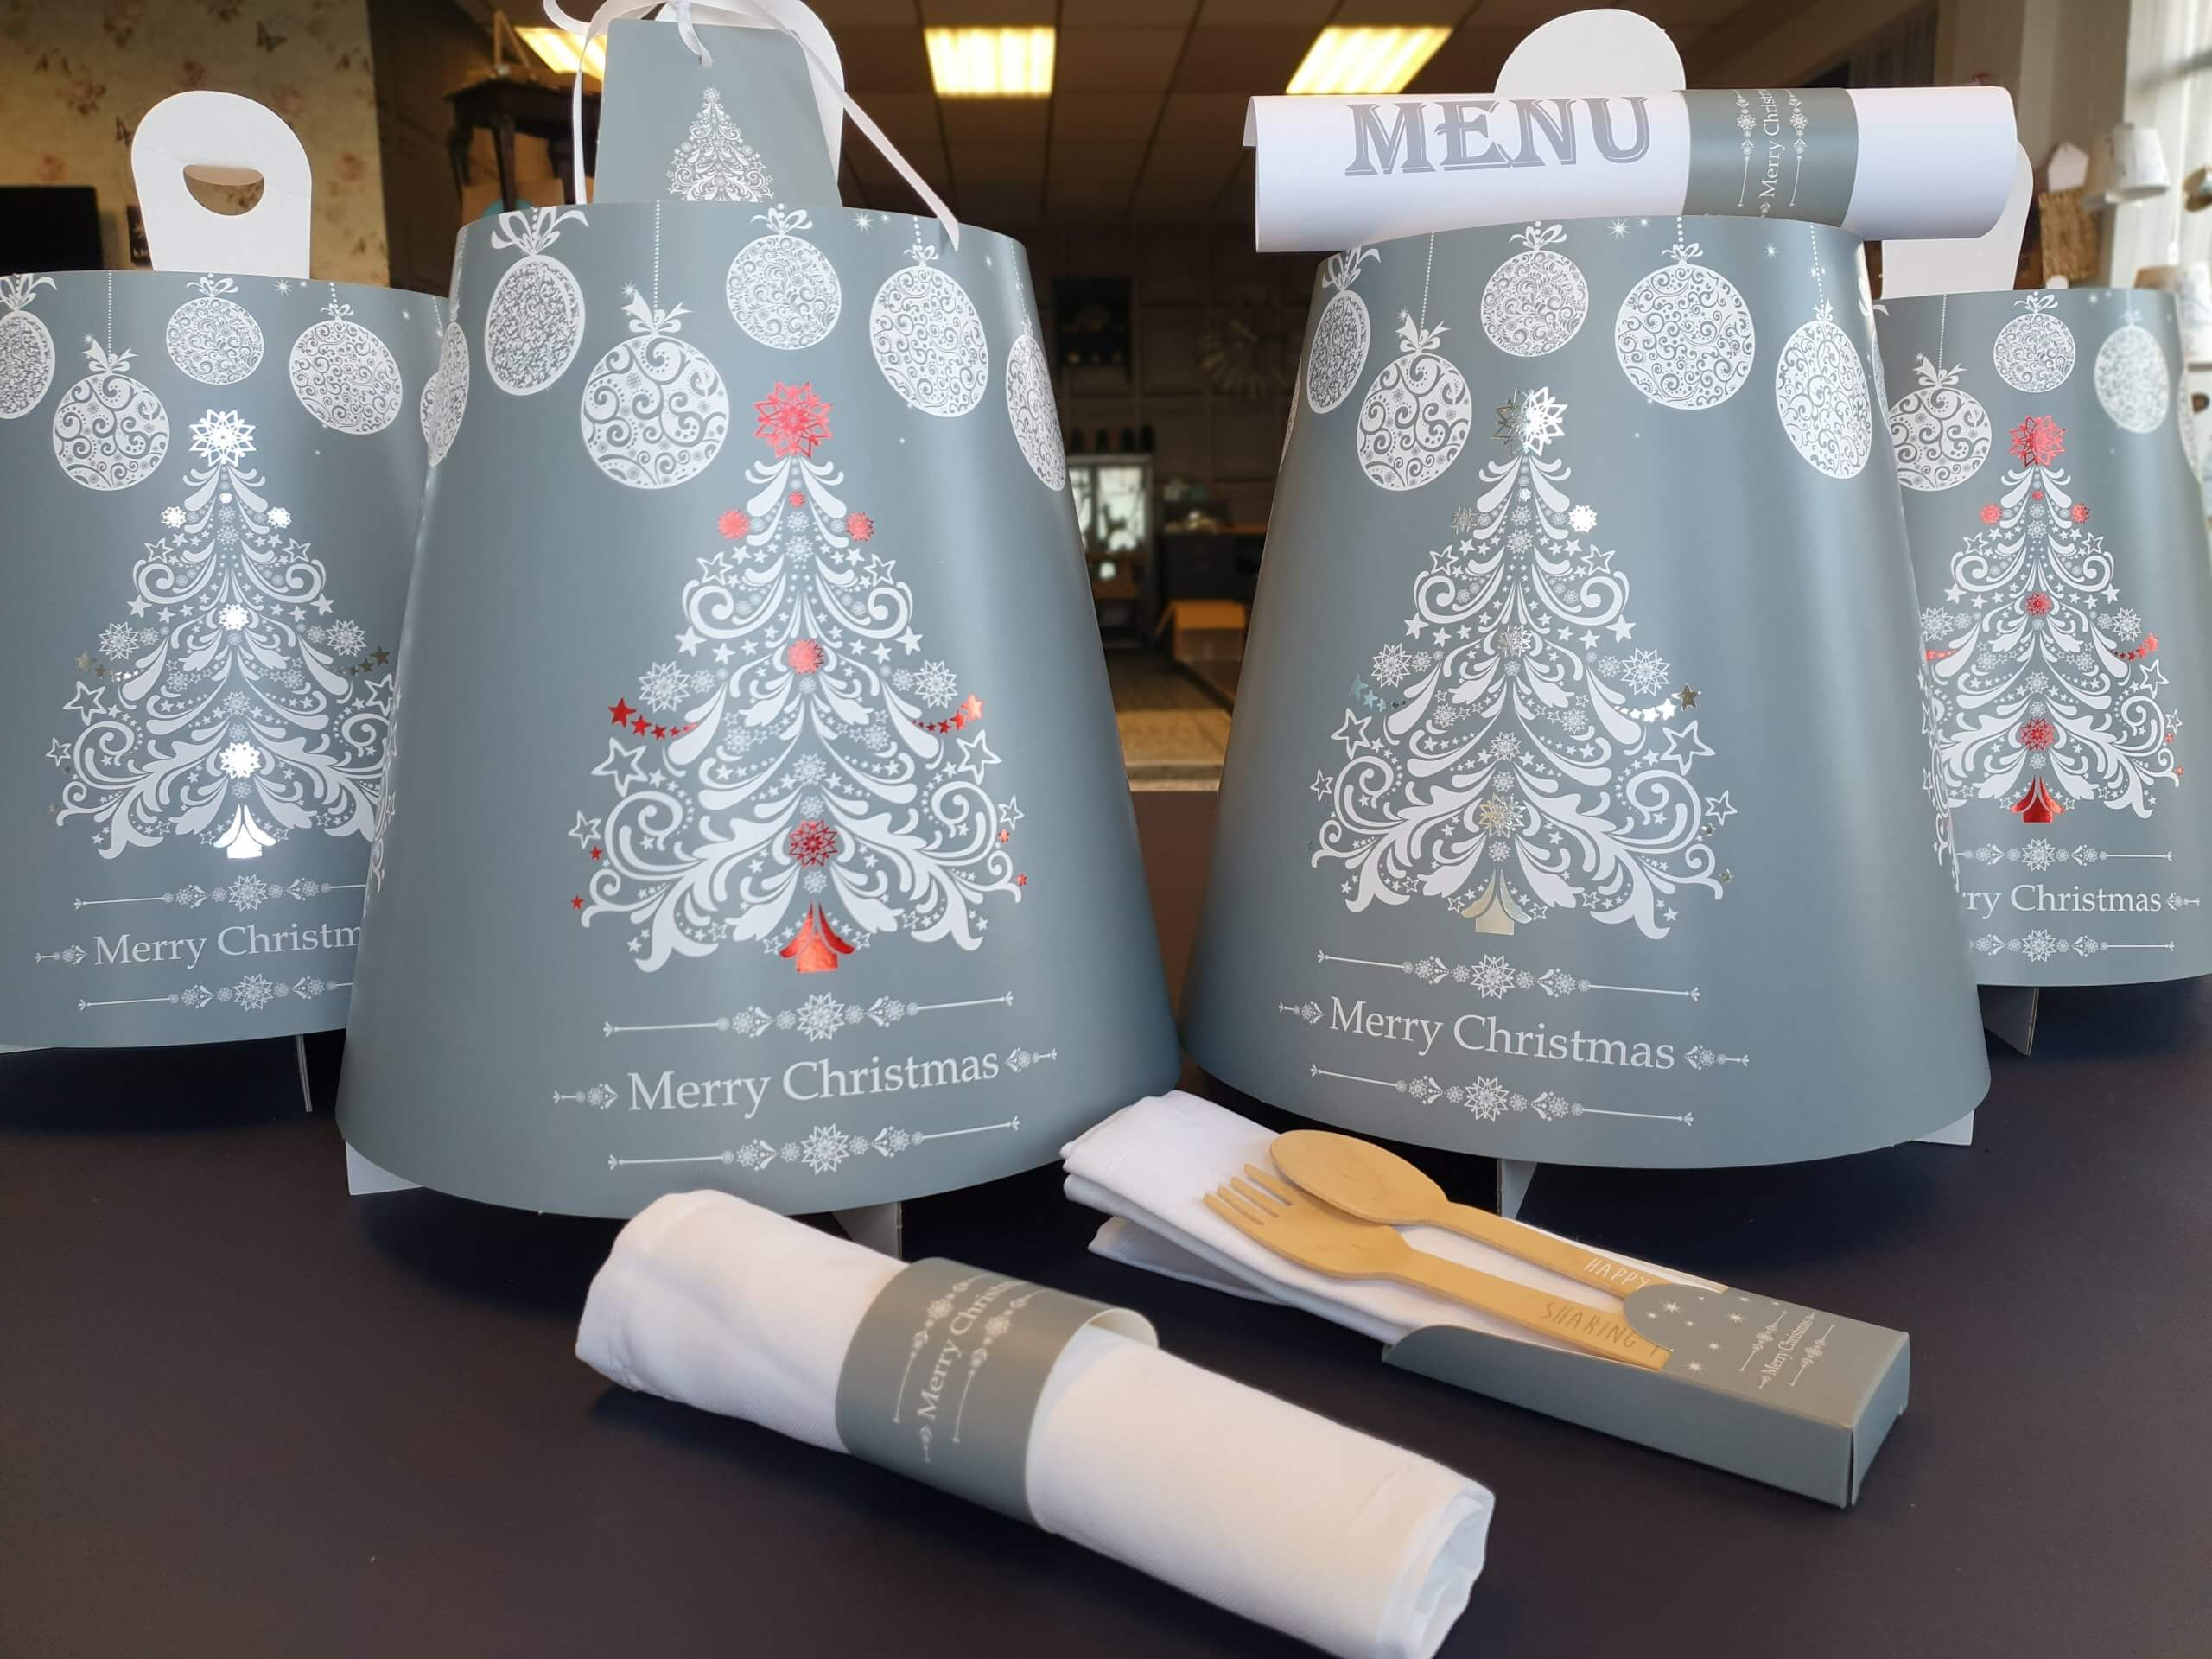 4 Tier Tea Caddy Christmas Tree Print & Hot Foil